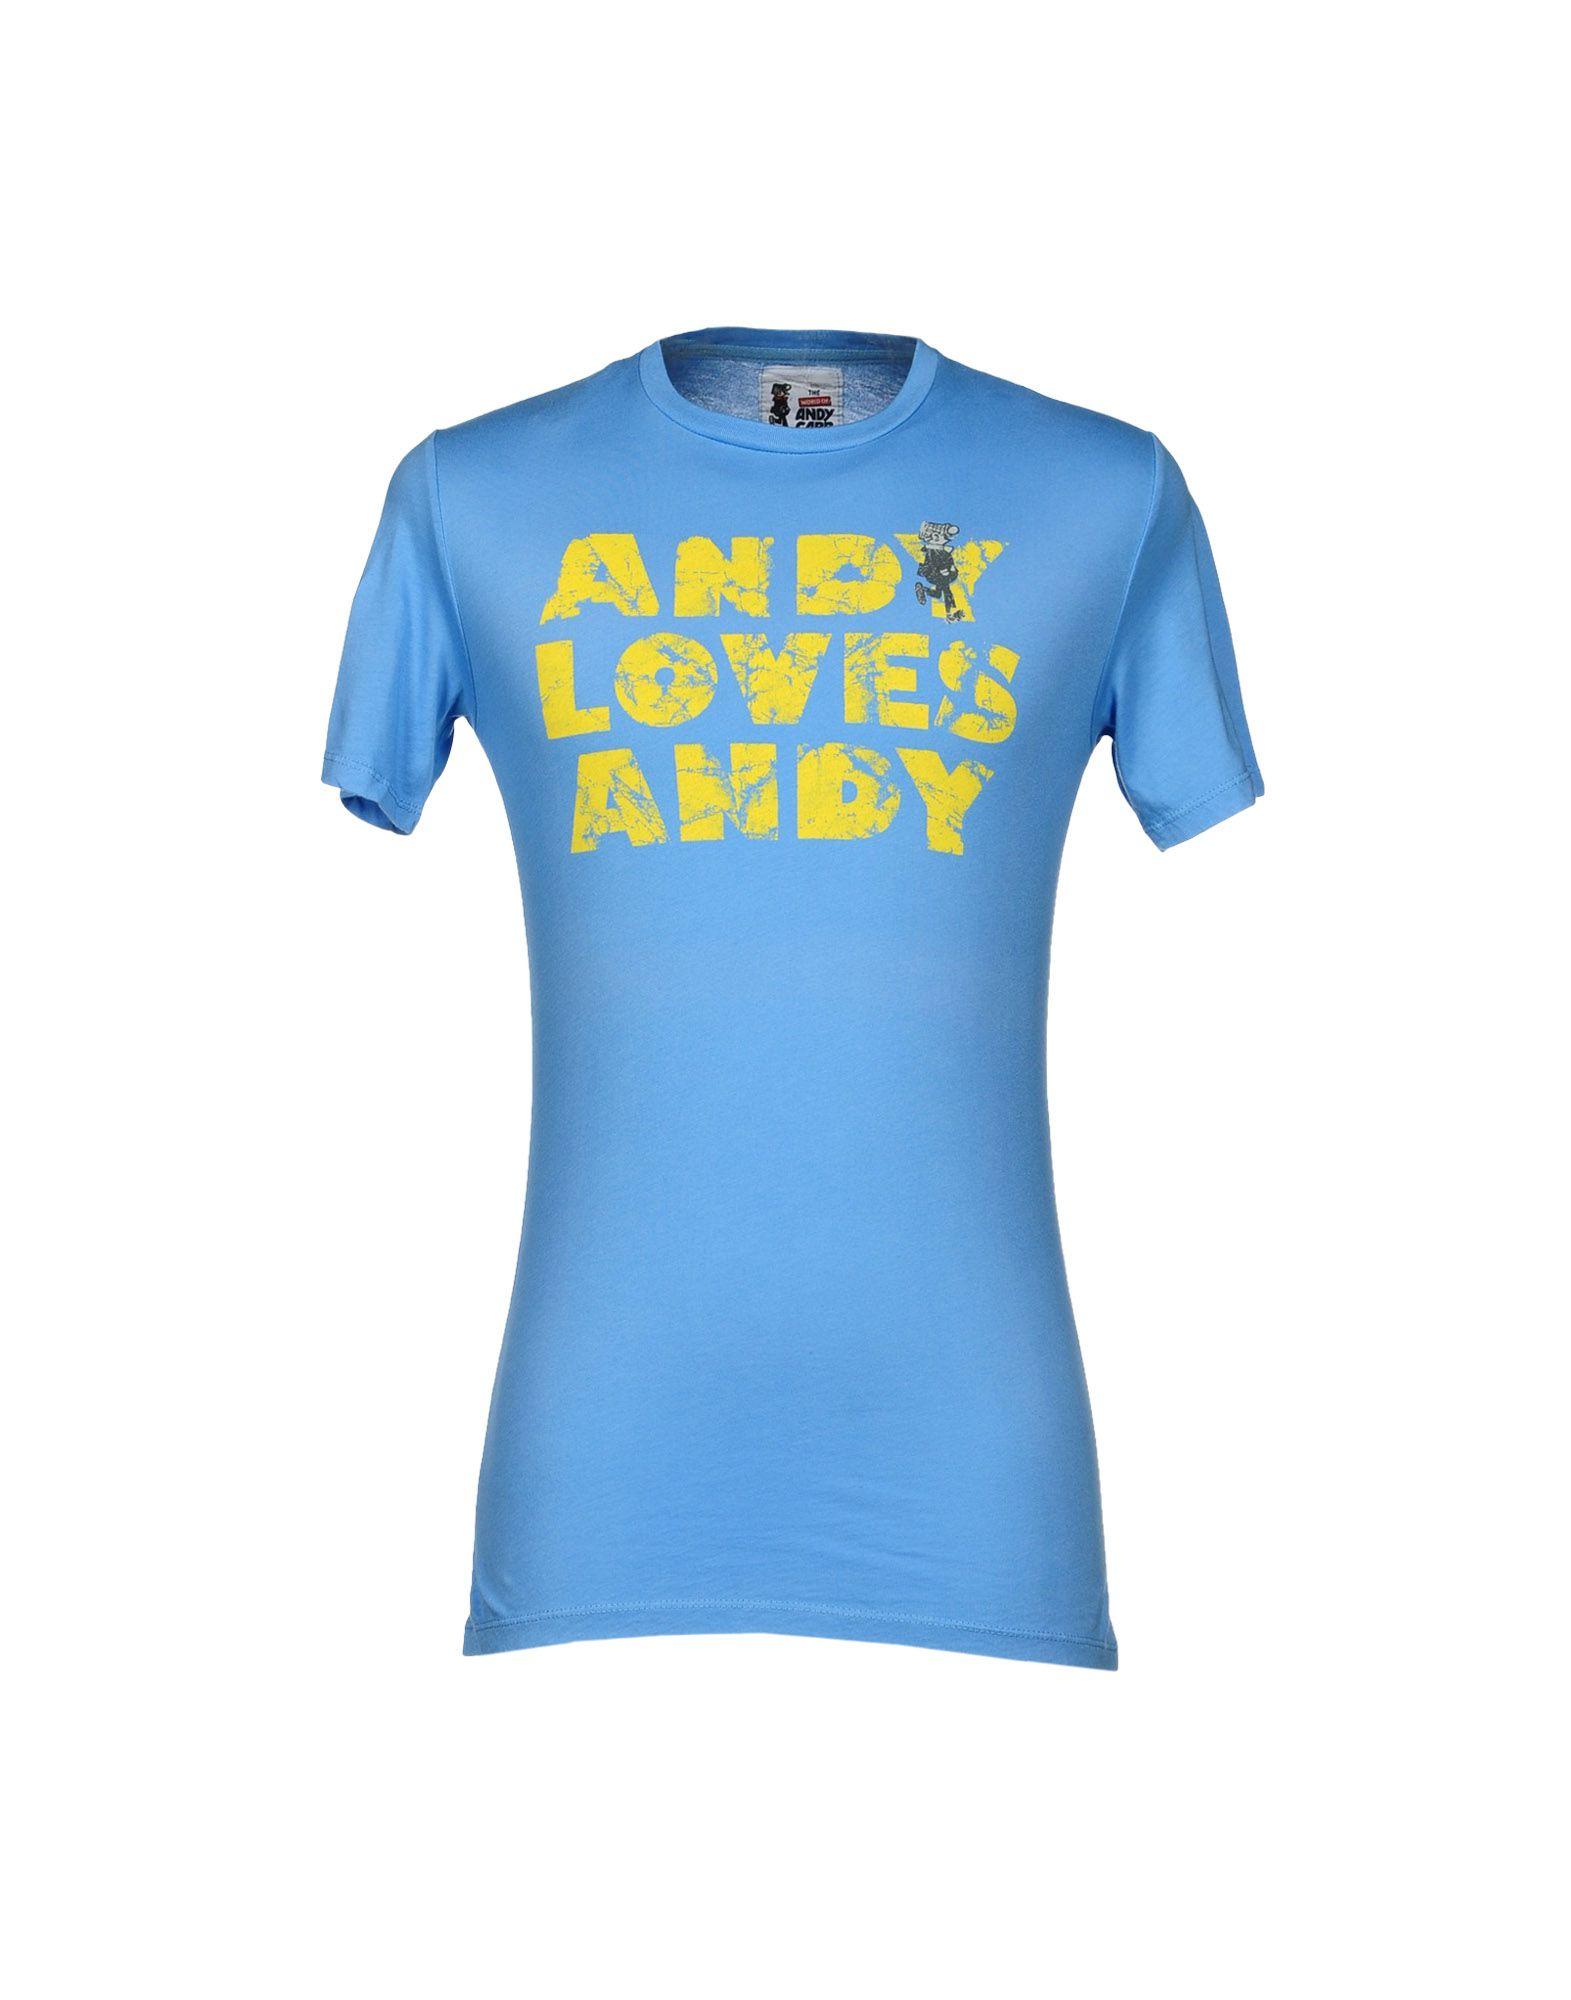 THE WORLD OF ANDY CAPP BY GECO BRAND Herren T-shirts Farbe Azurblau Größe 4